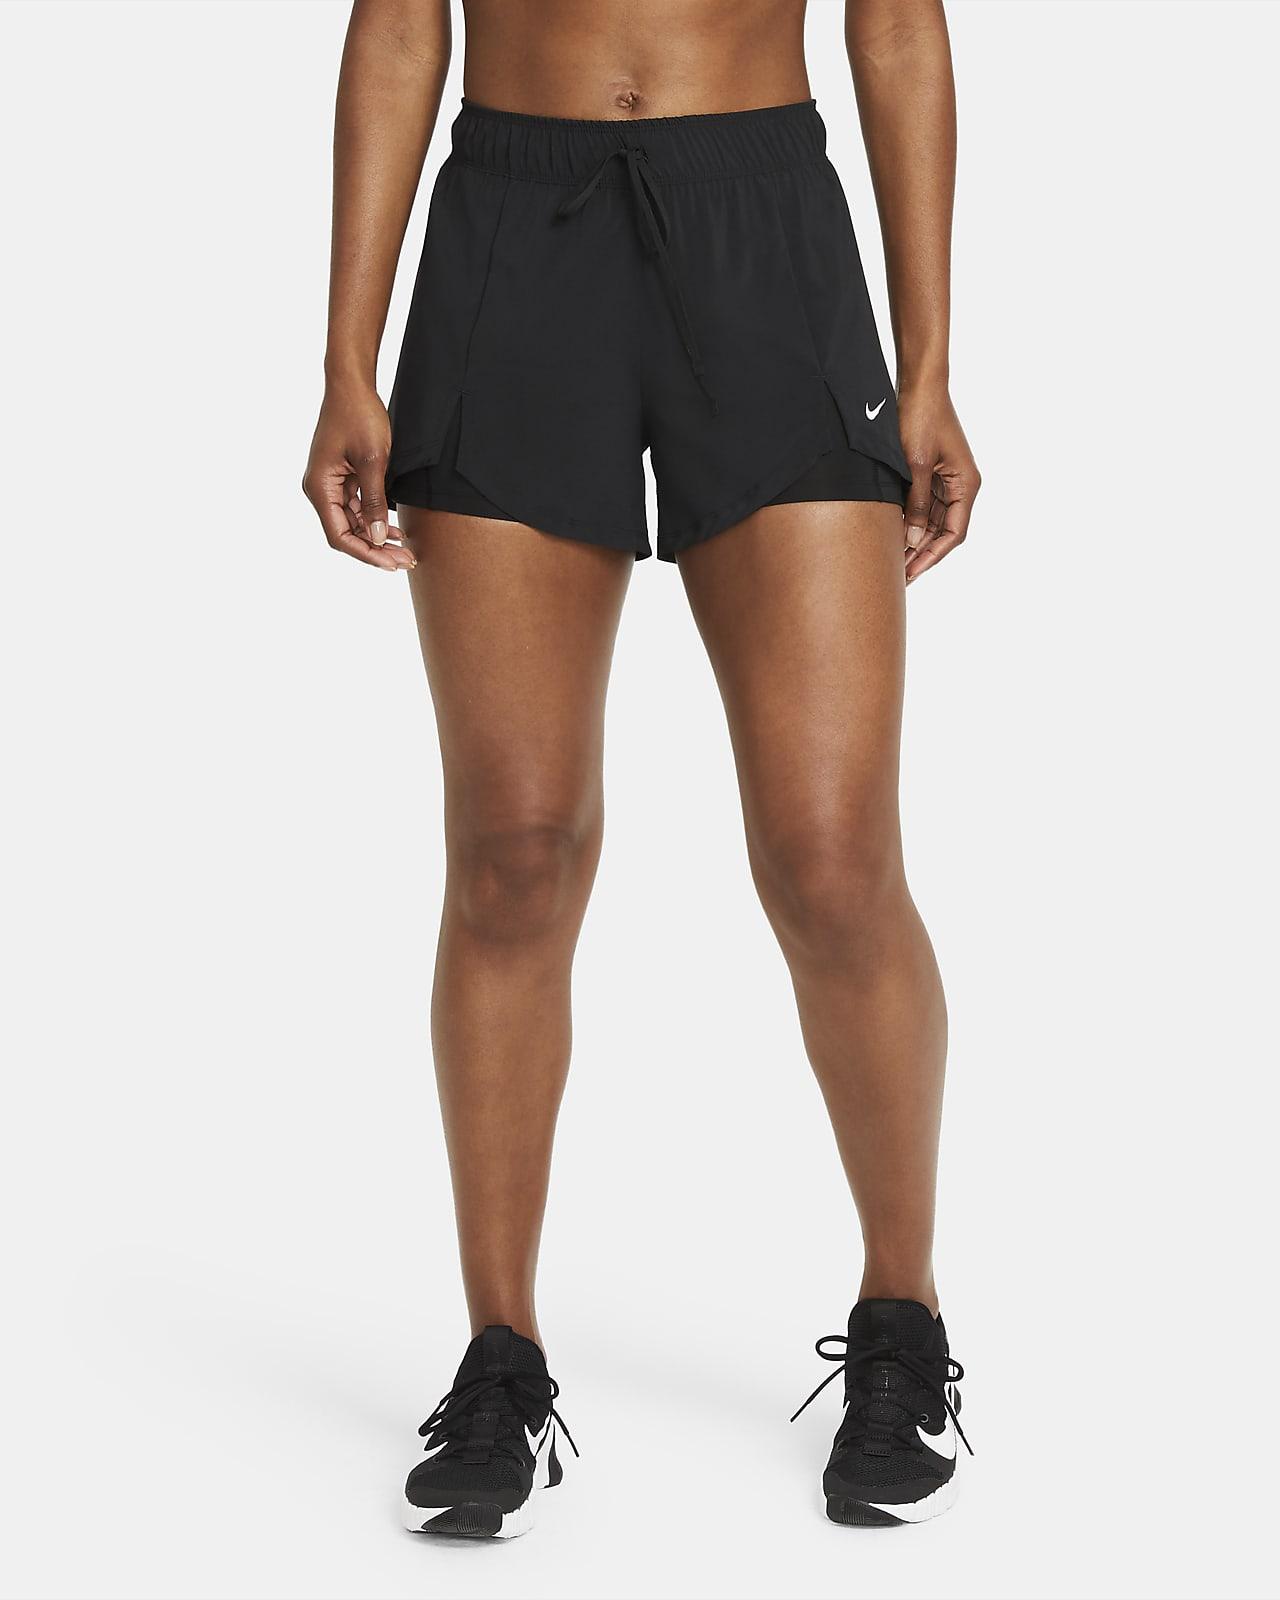 Женские шорты для тренинга Nike Flex Essential 2-in-1